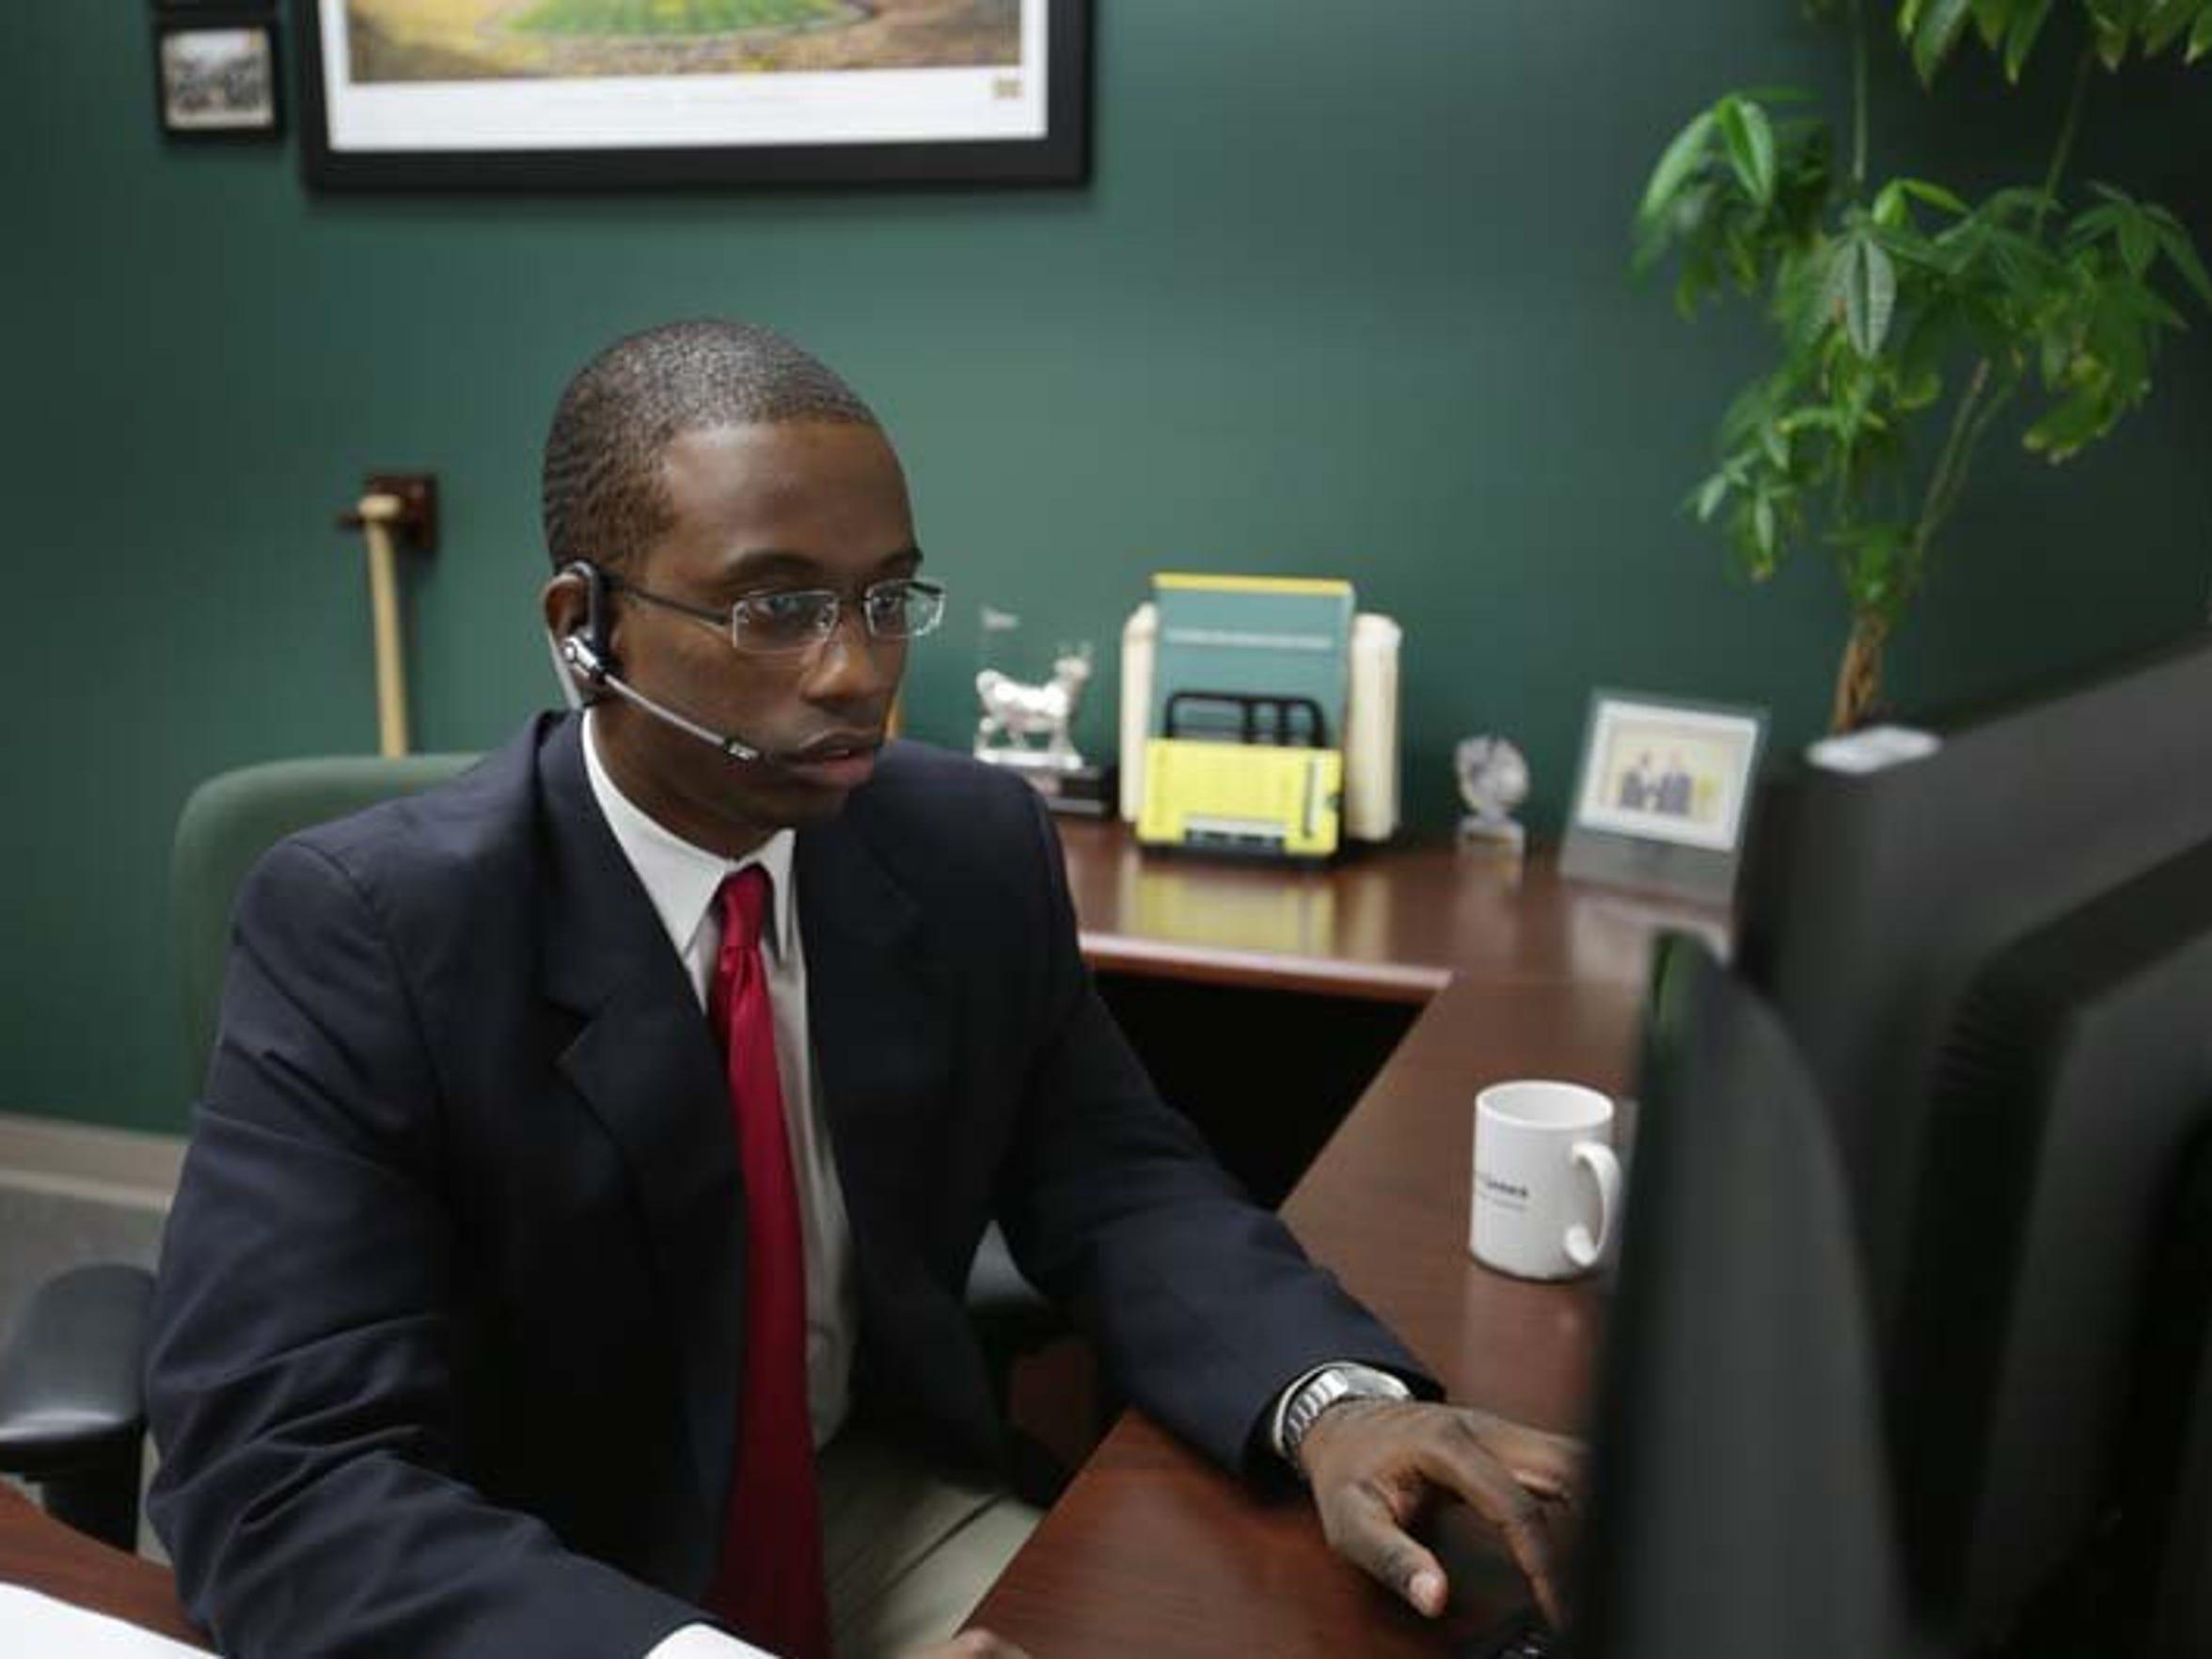 Edward Jones' financial adviser Robynne Henry works